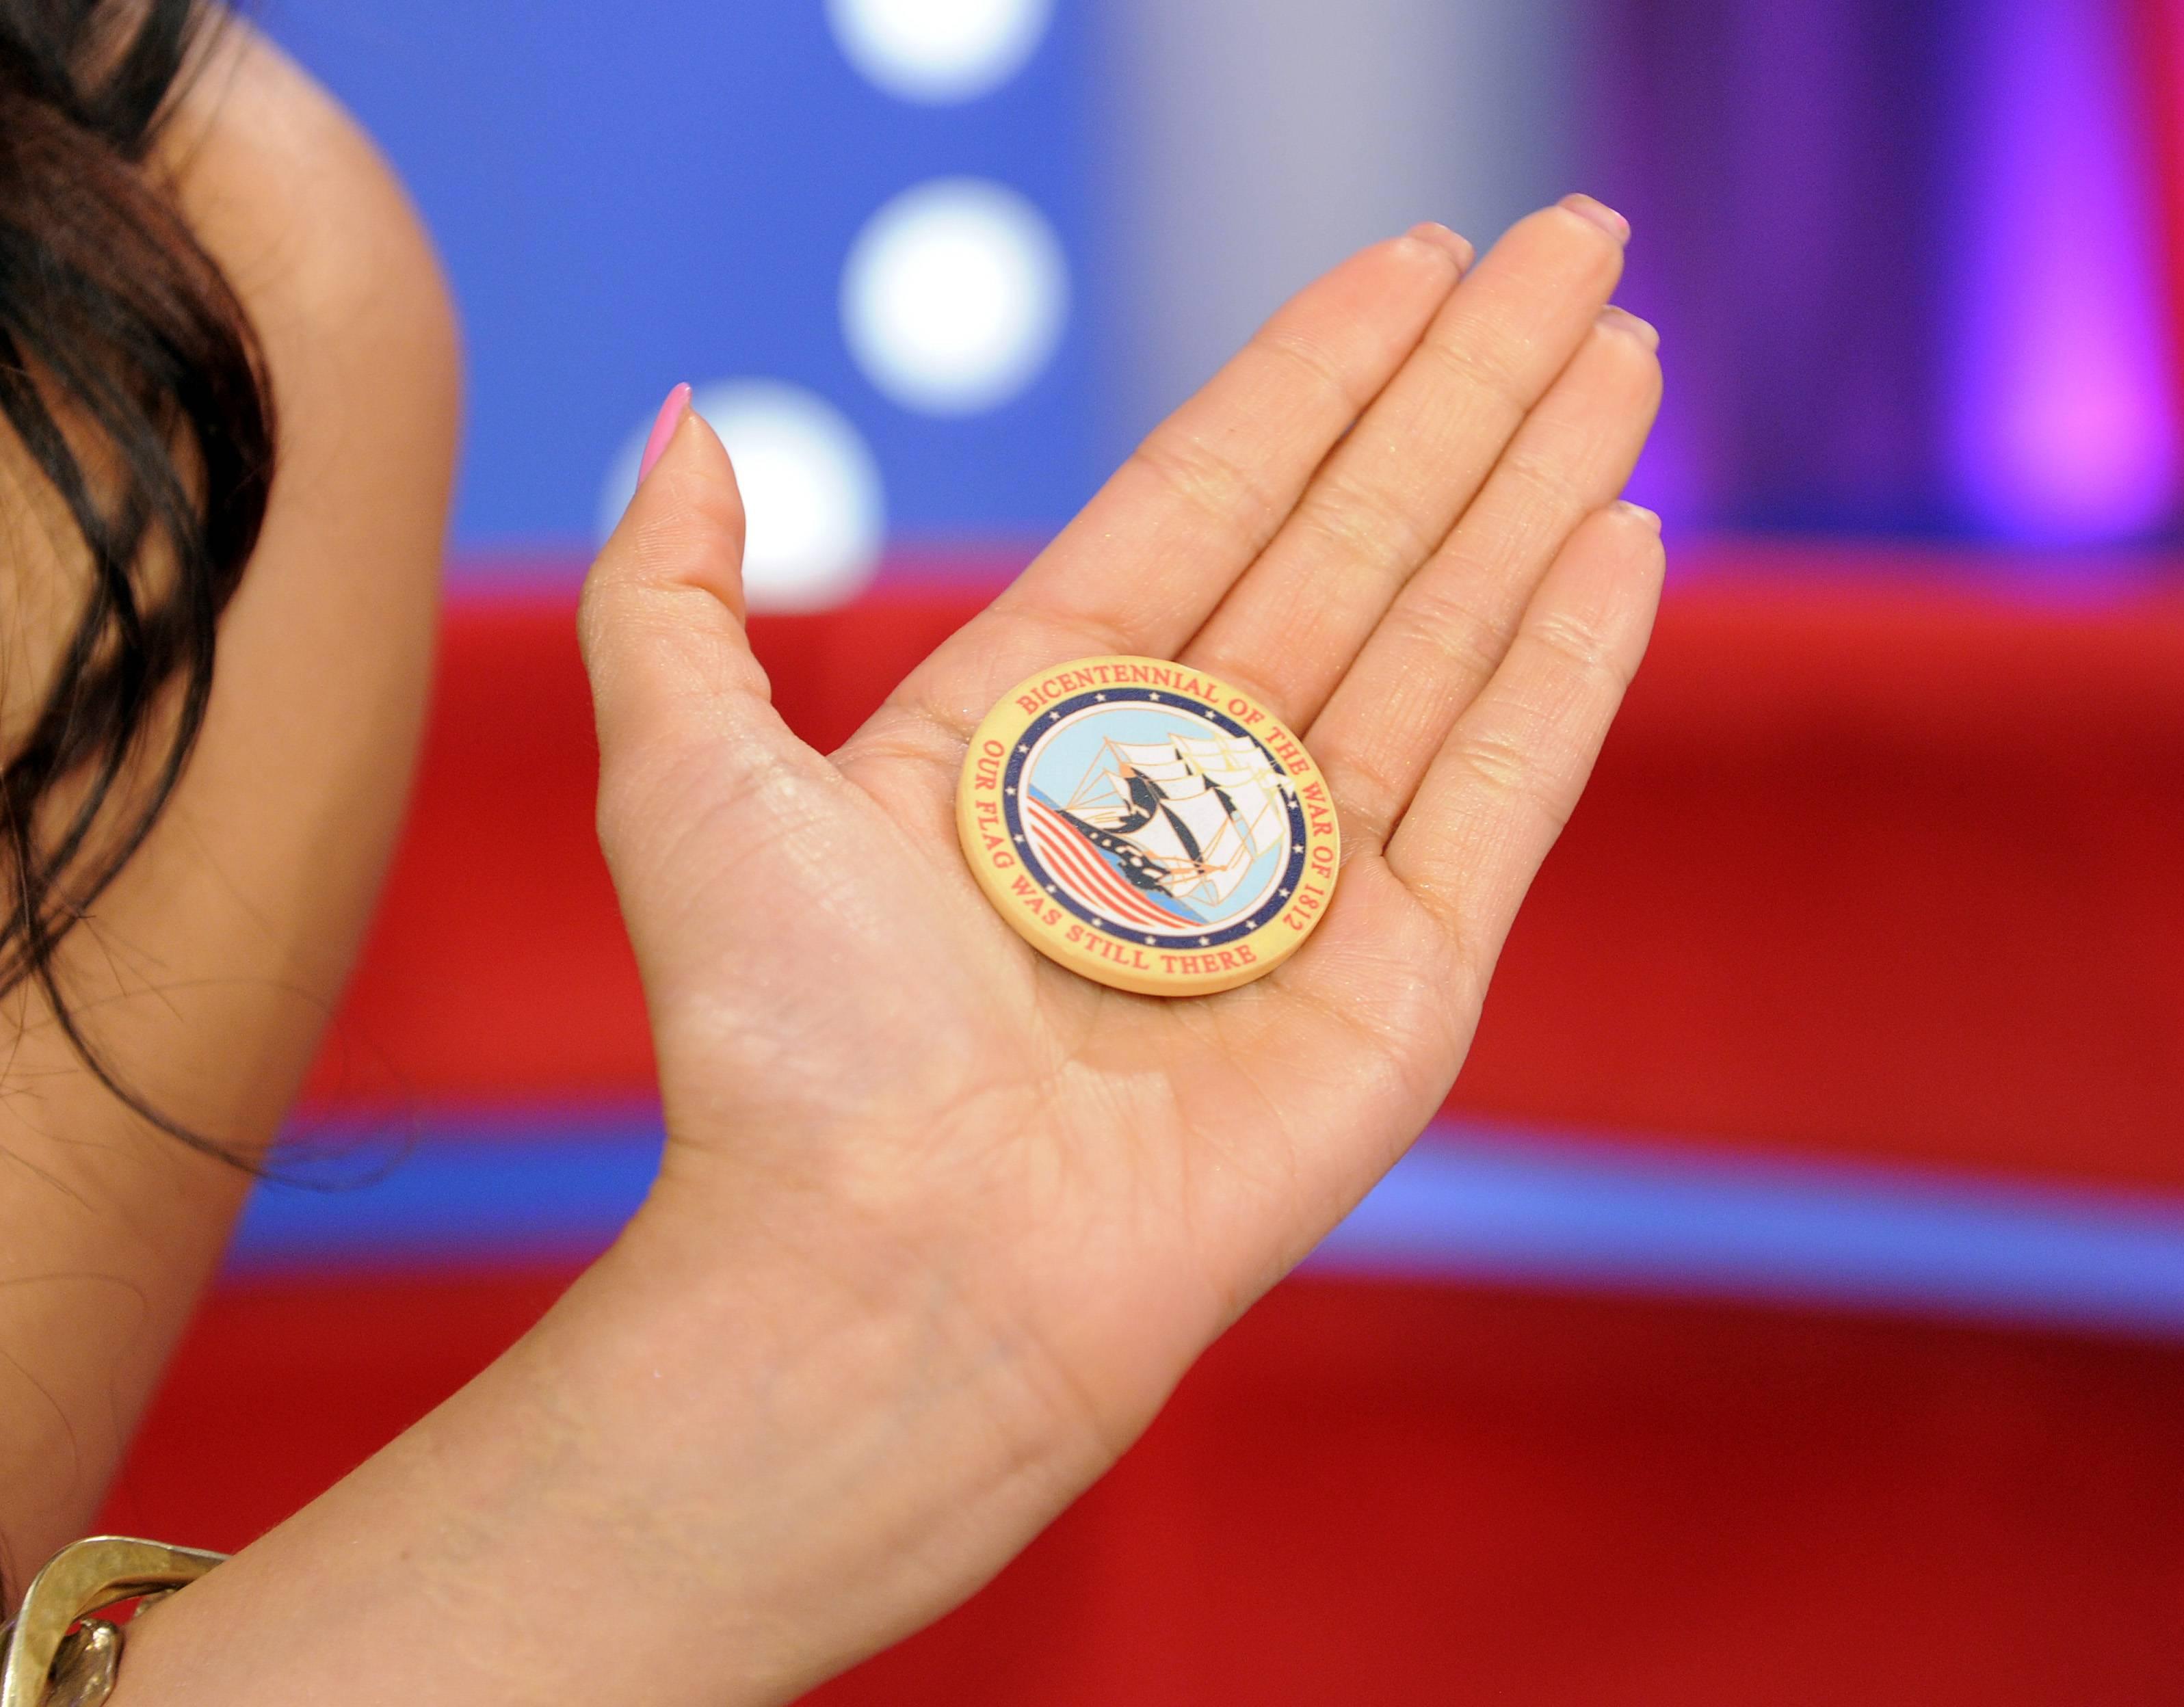 Nice - A US Marine presents Rocsi Diaz with a token of their appreciation at 106 & Park, May 29, 2012. (Photo: John Ricard / BET)